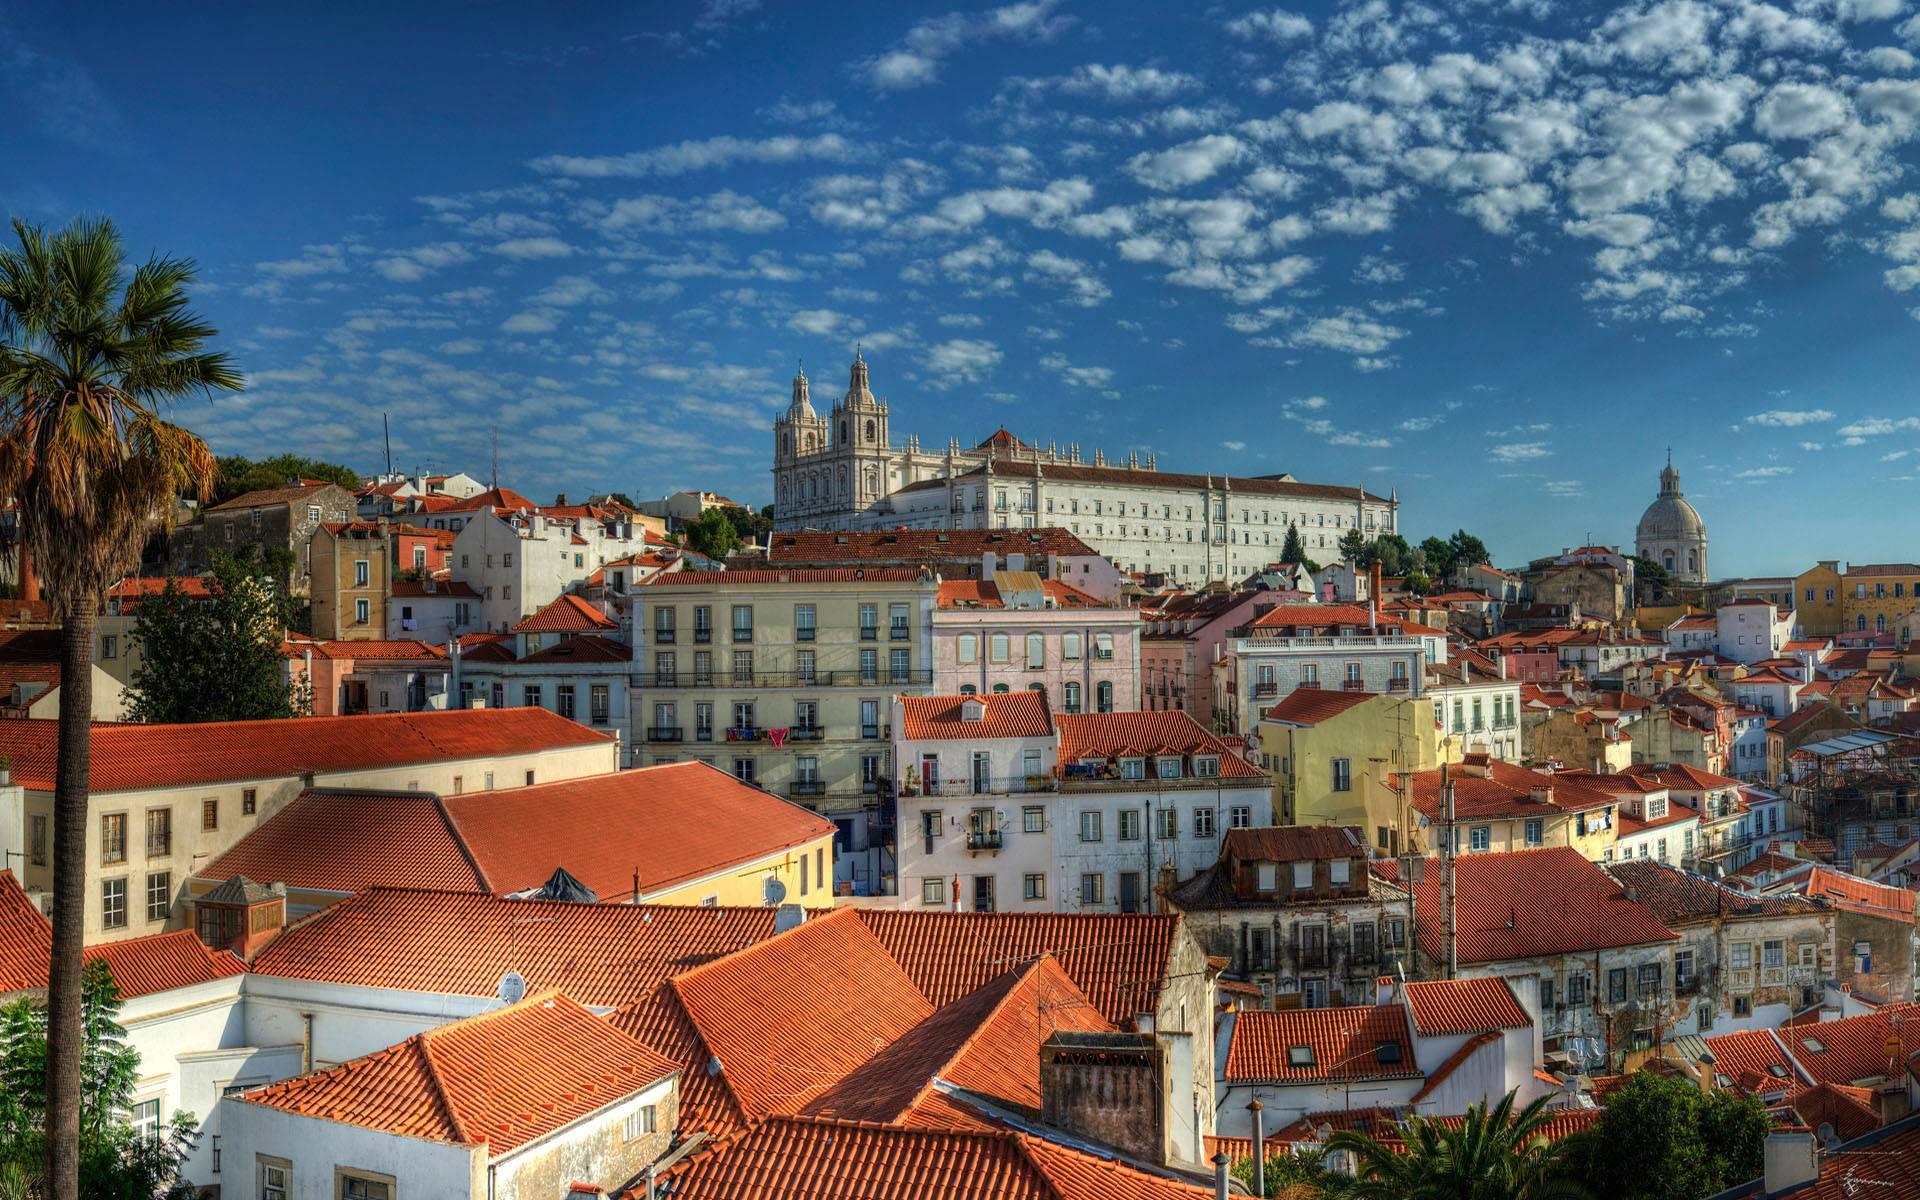 4 Day Portugal Tour Including A Fatima Excursion Tours4fun